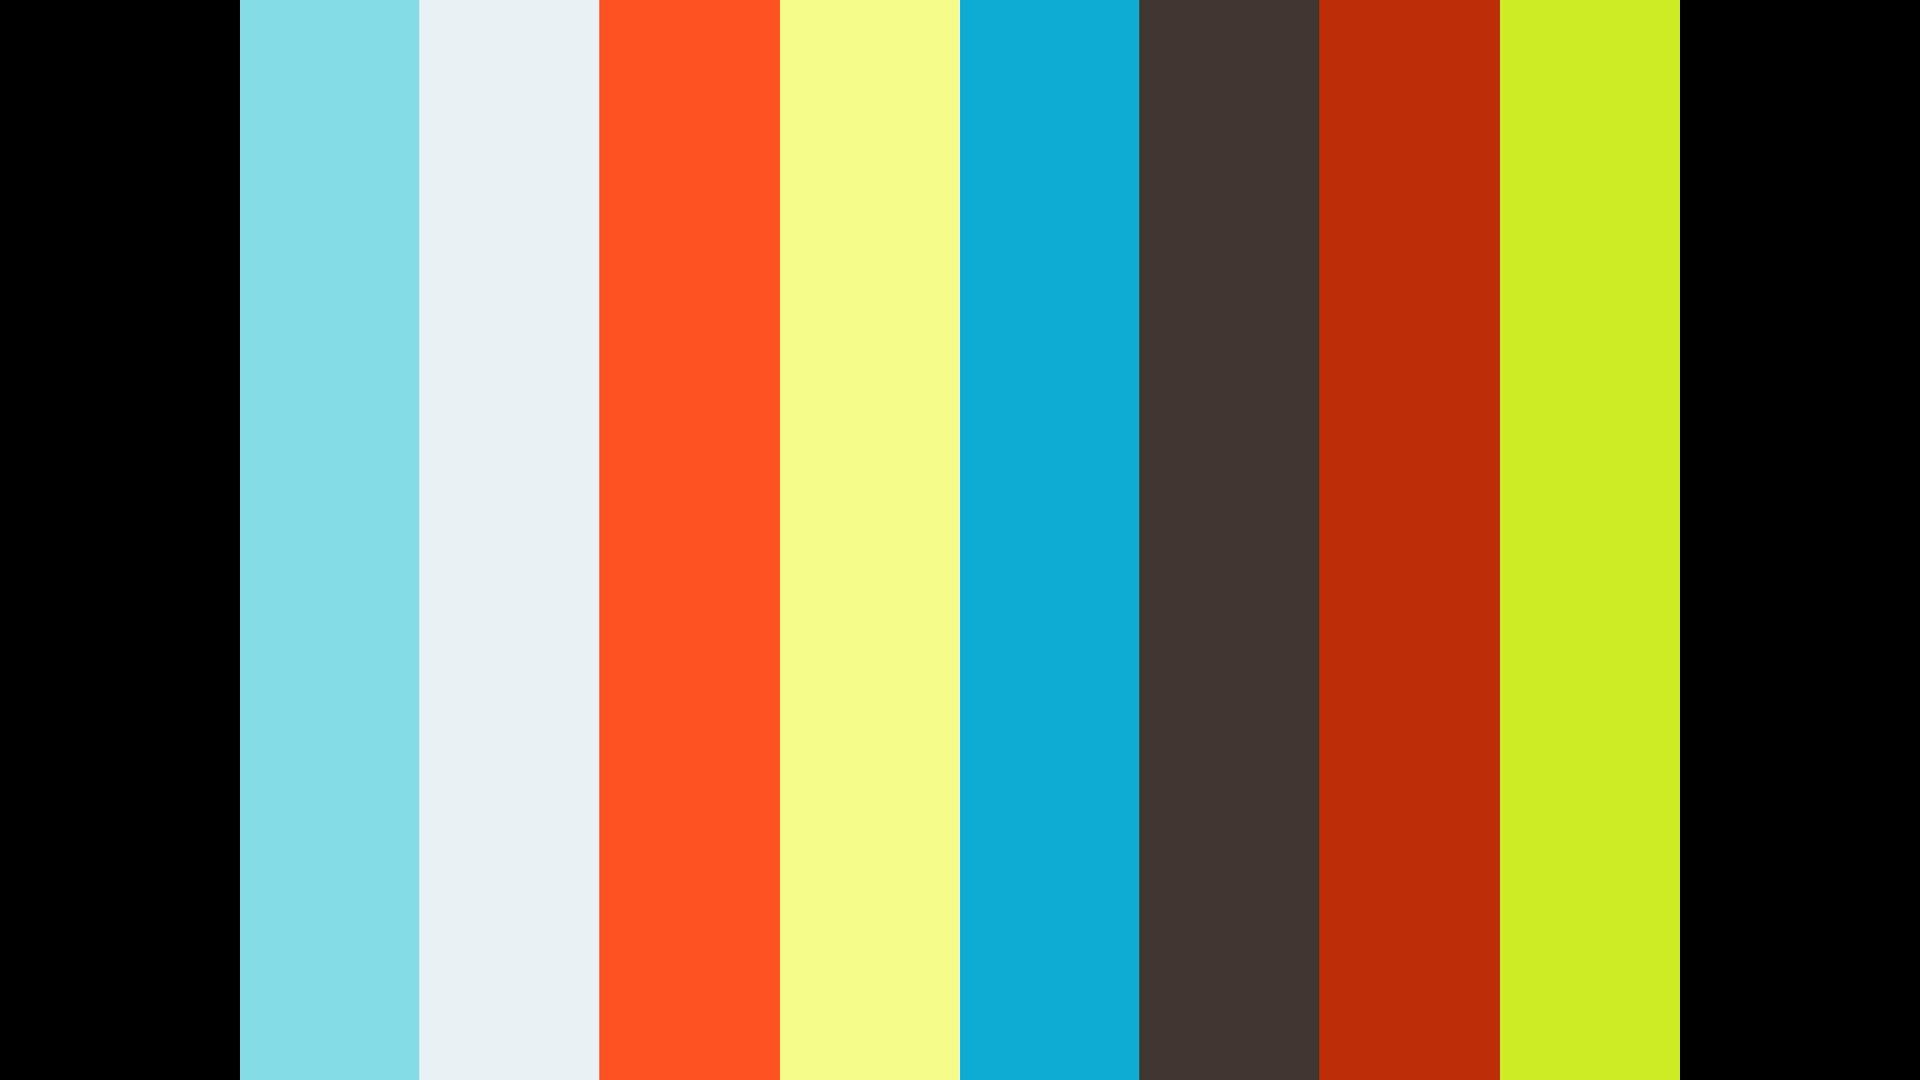 JASI-2018-PRELIM-NW Rankin HS Rhapsody